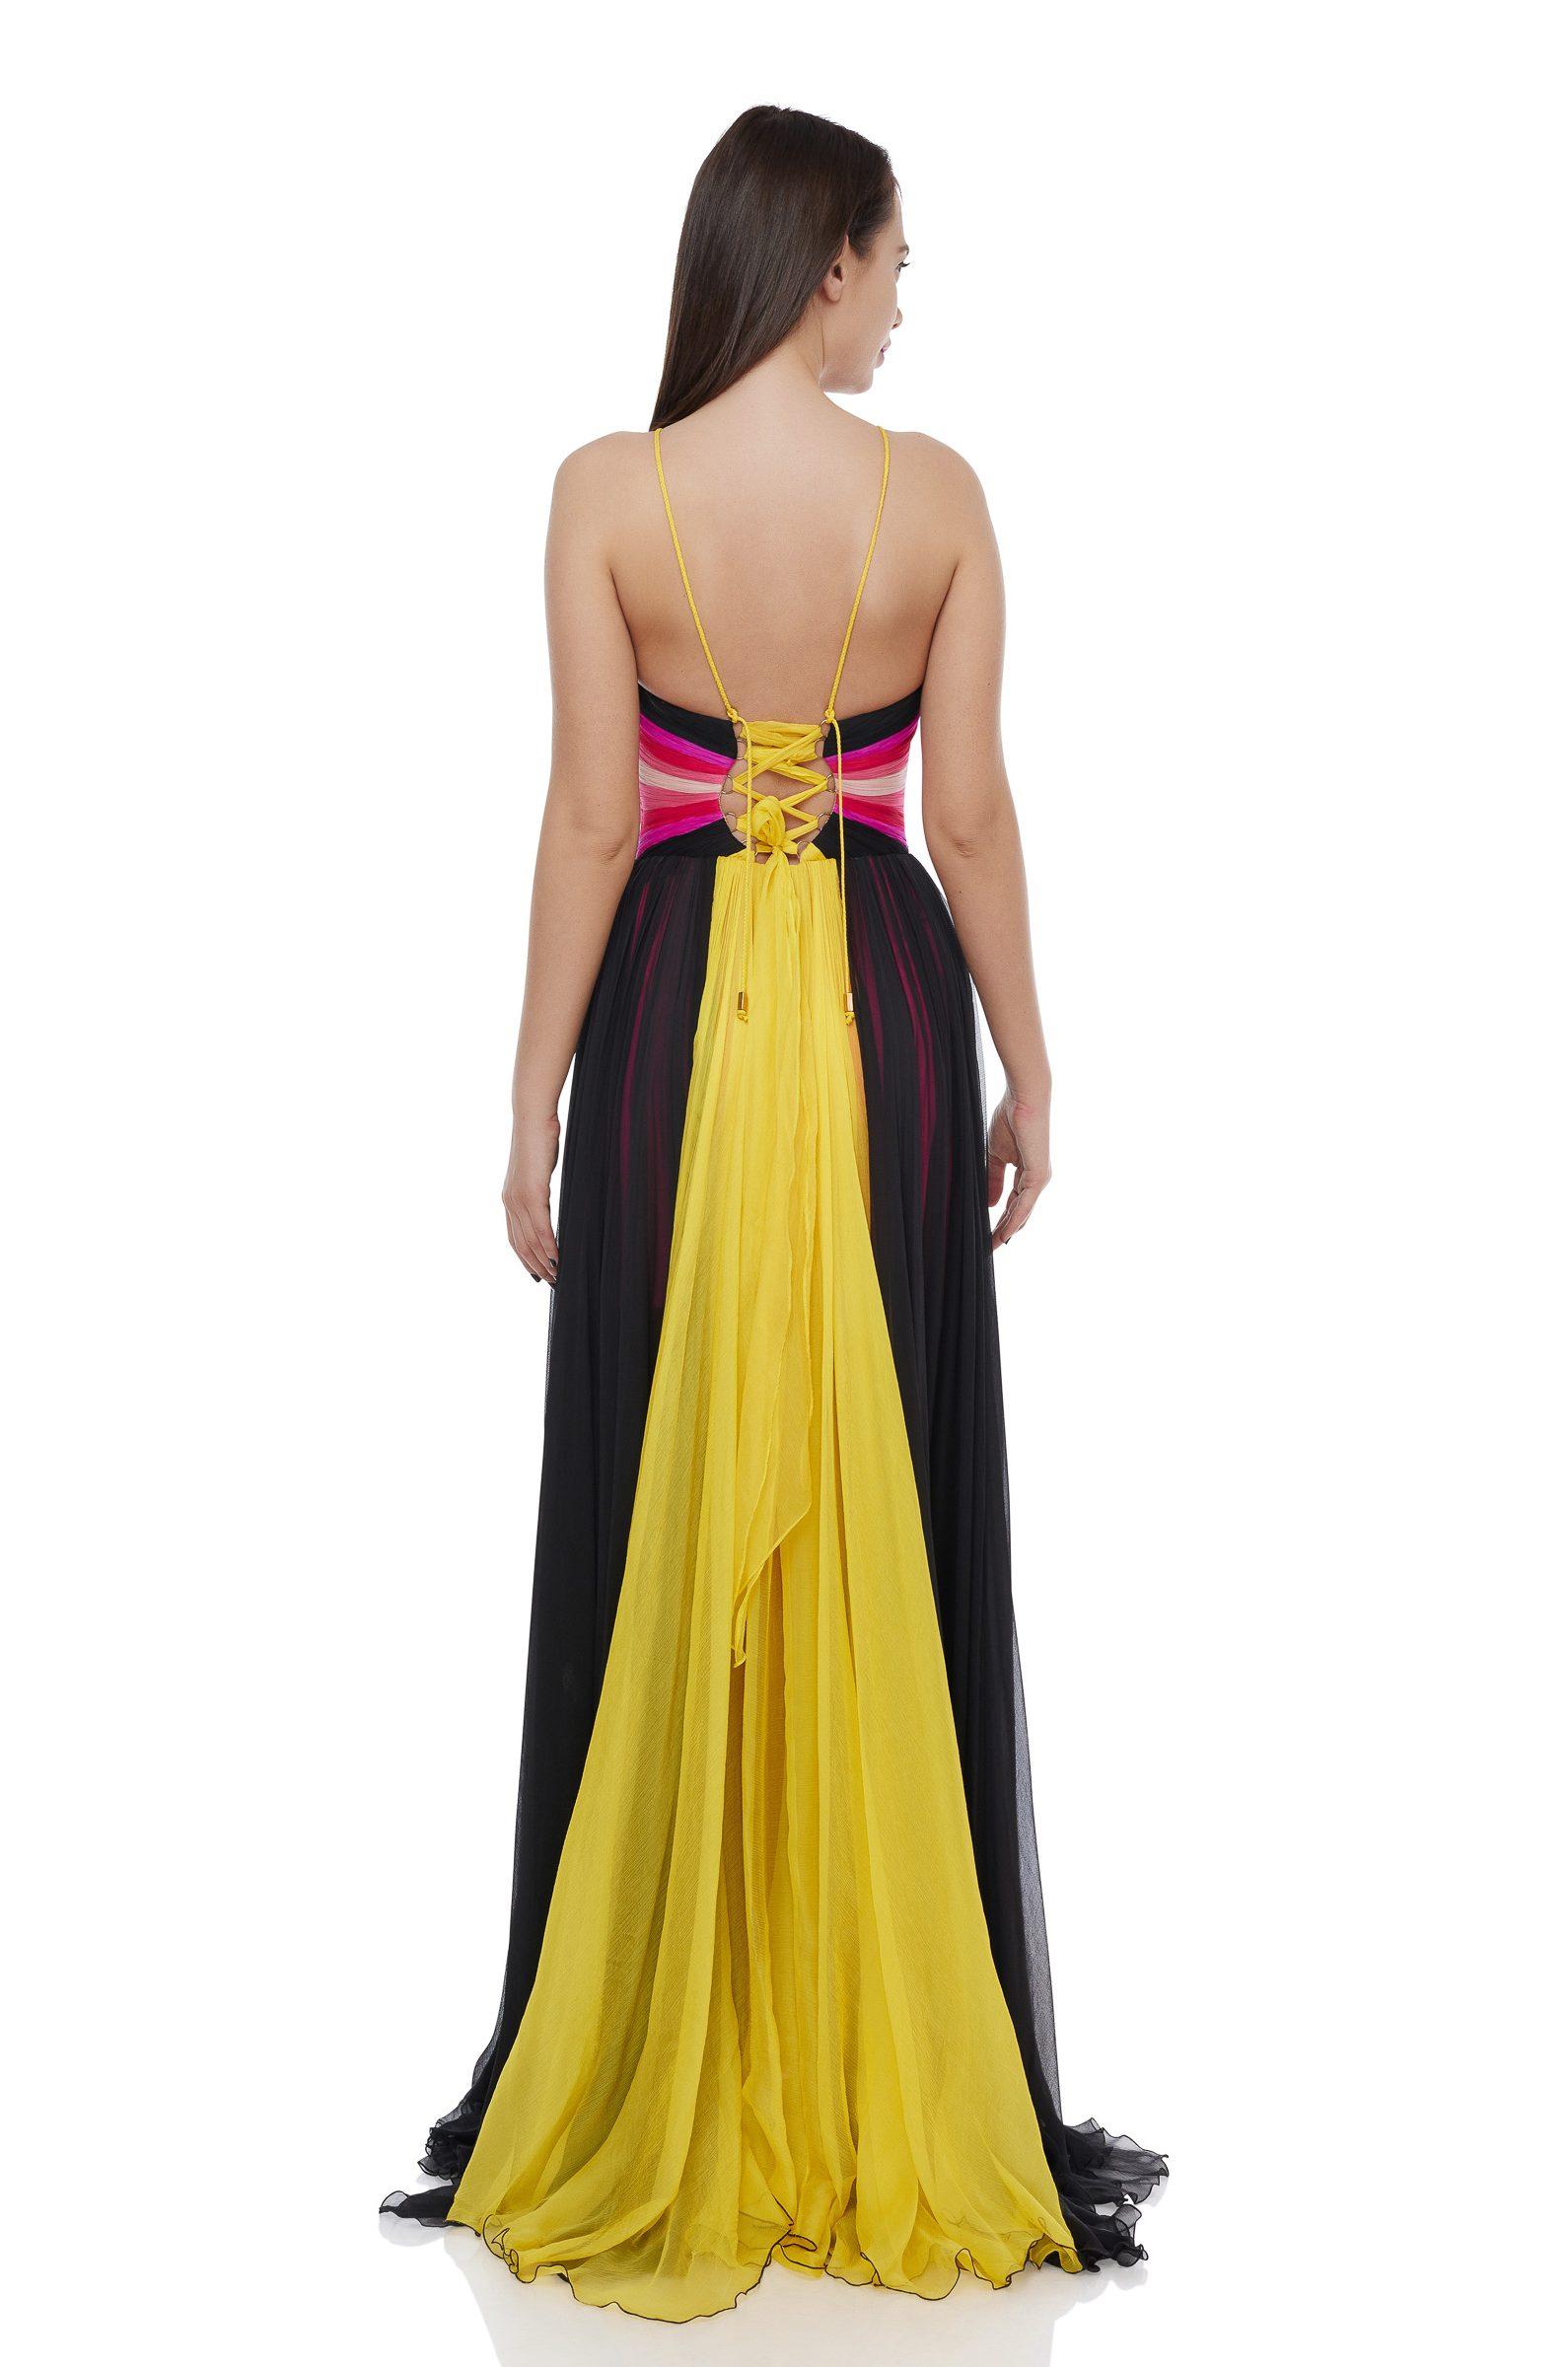 Multicolored corset evening dress